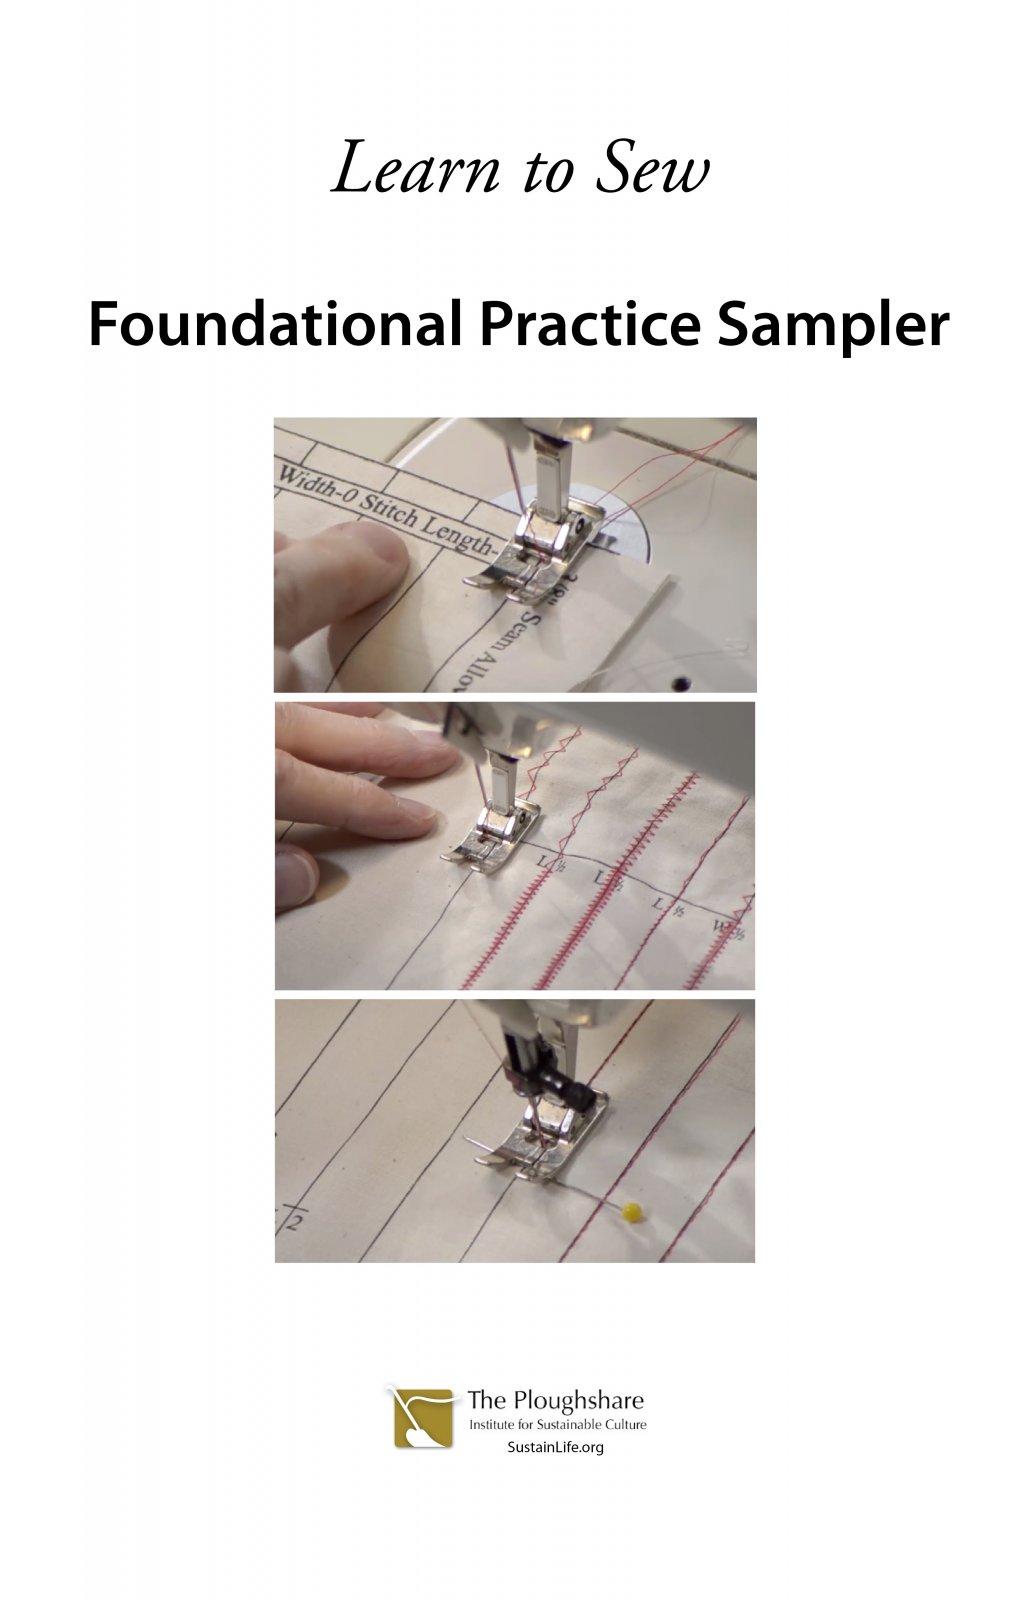 Foundational Practice Sampler